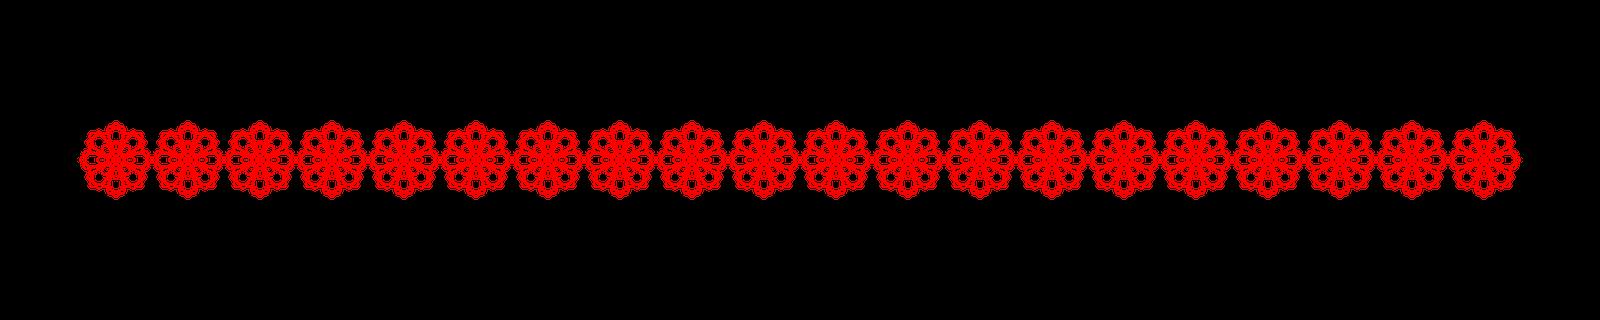 White lace border png. Laceborder hd transparent images